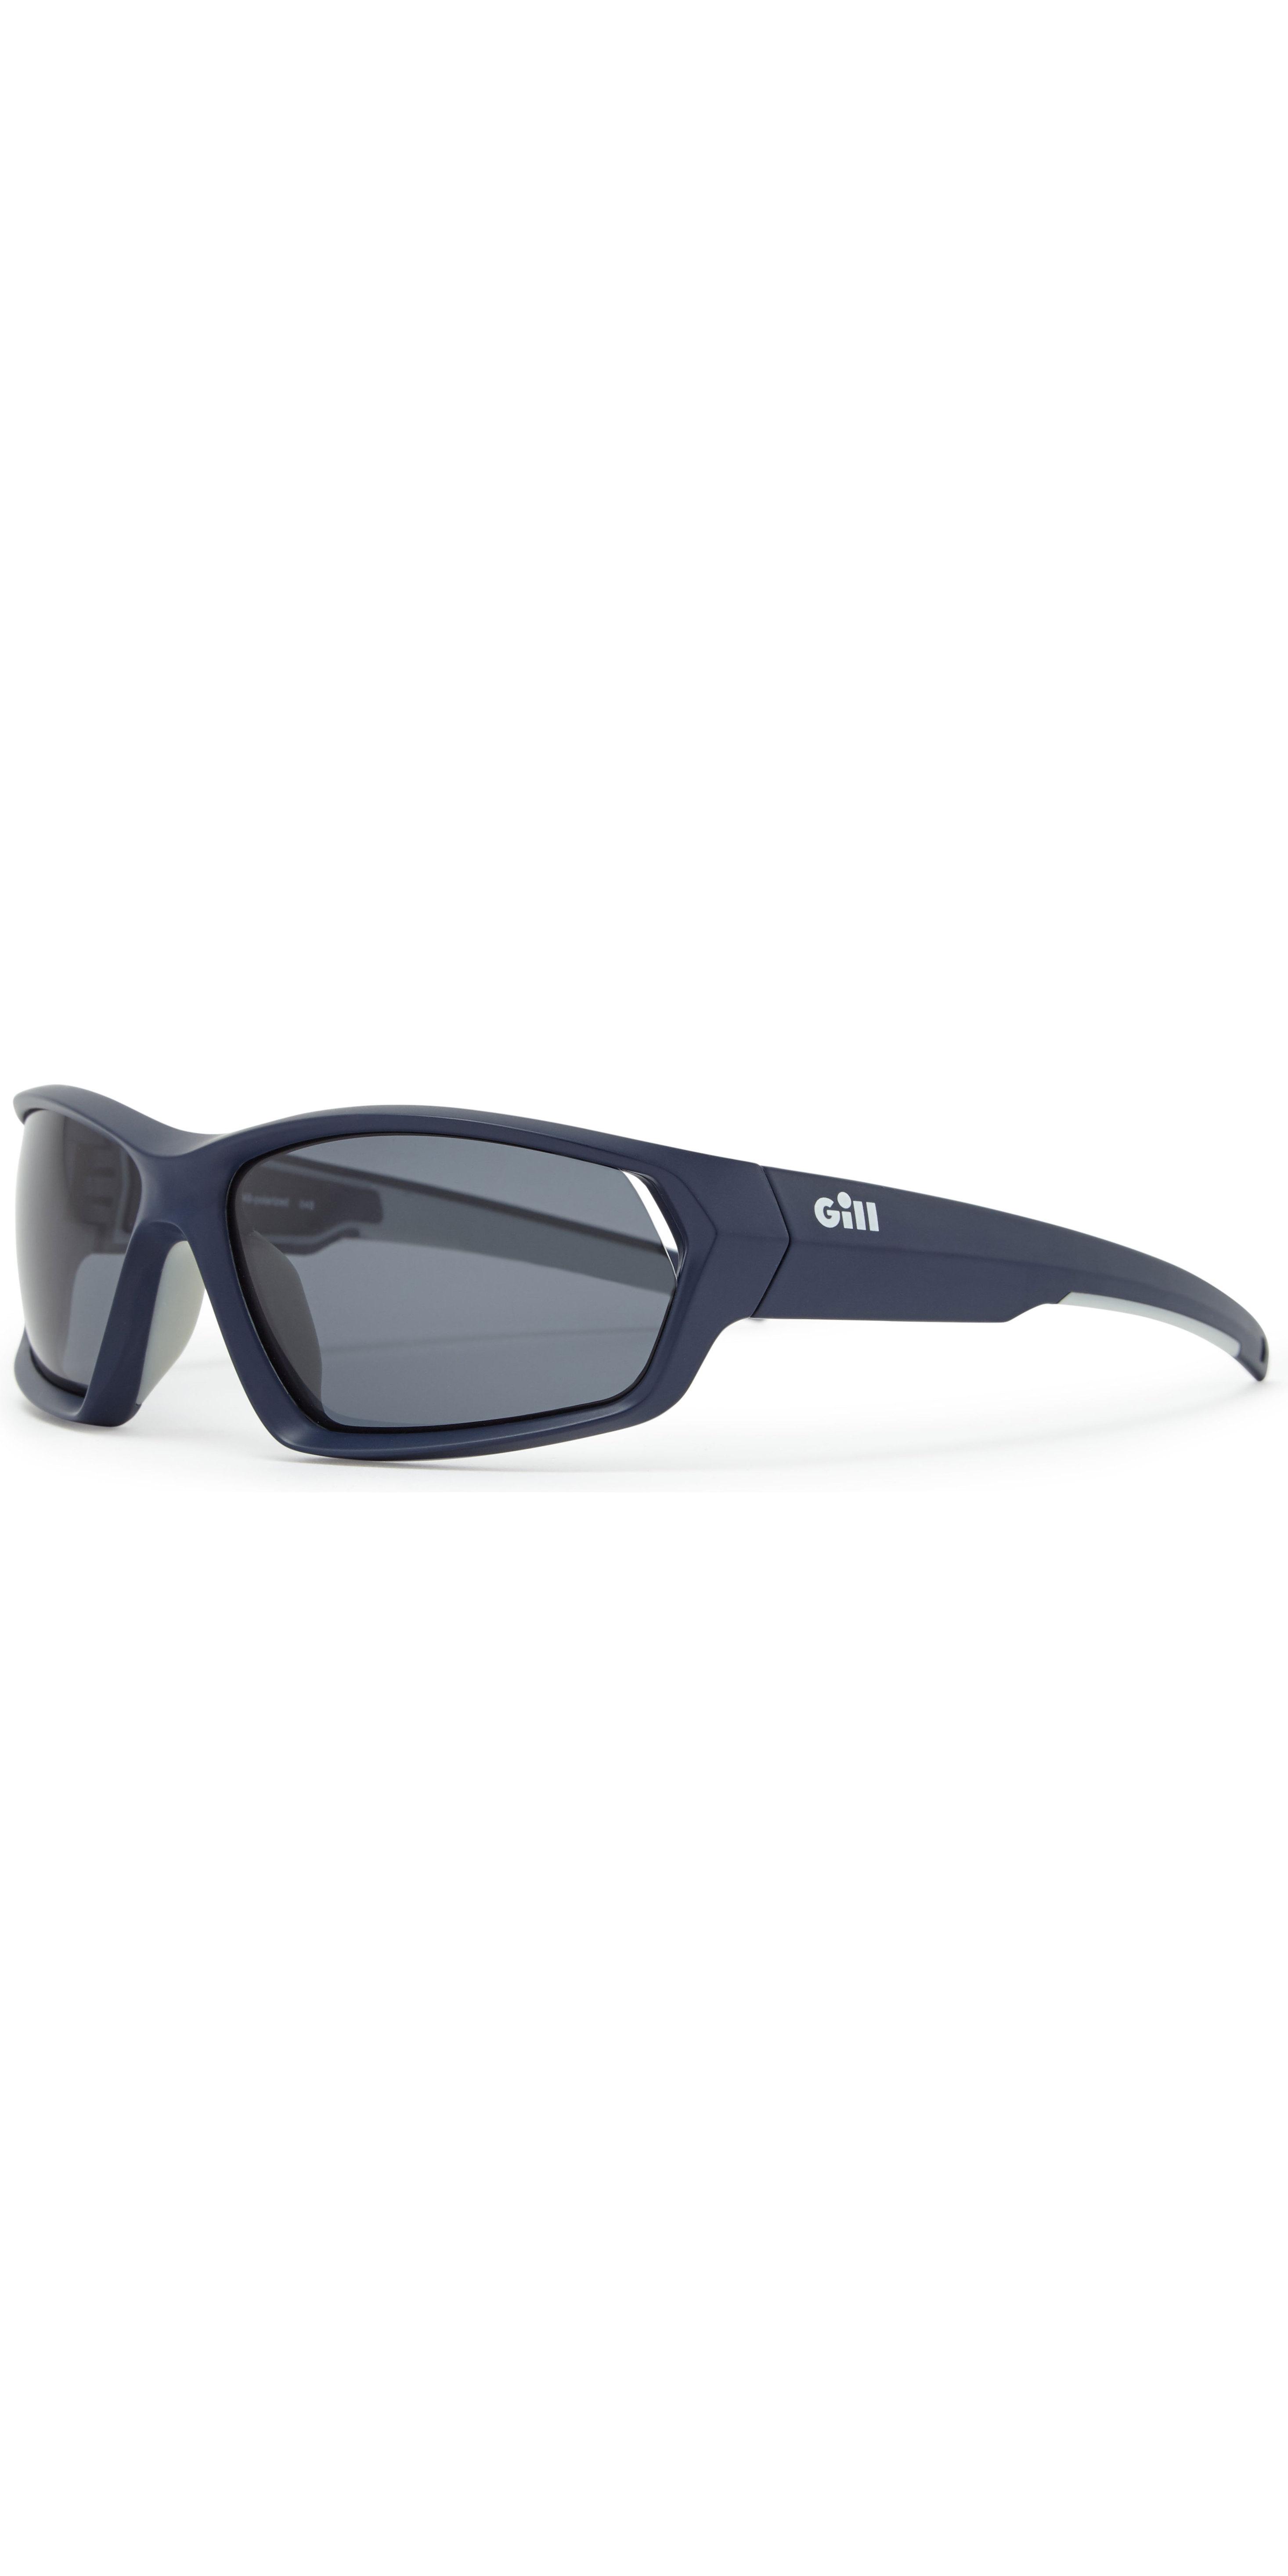 2019 Gill Marker Sunglasses Blue / Smoke 9674